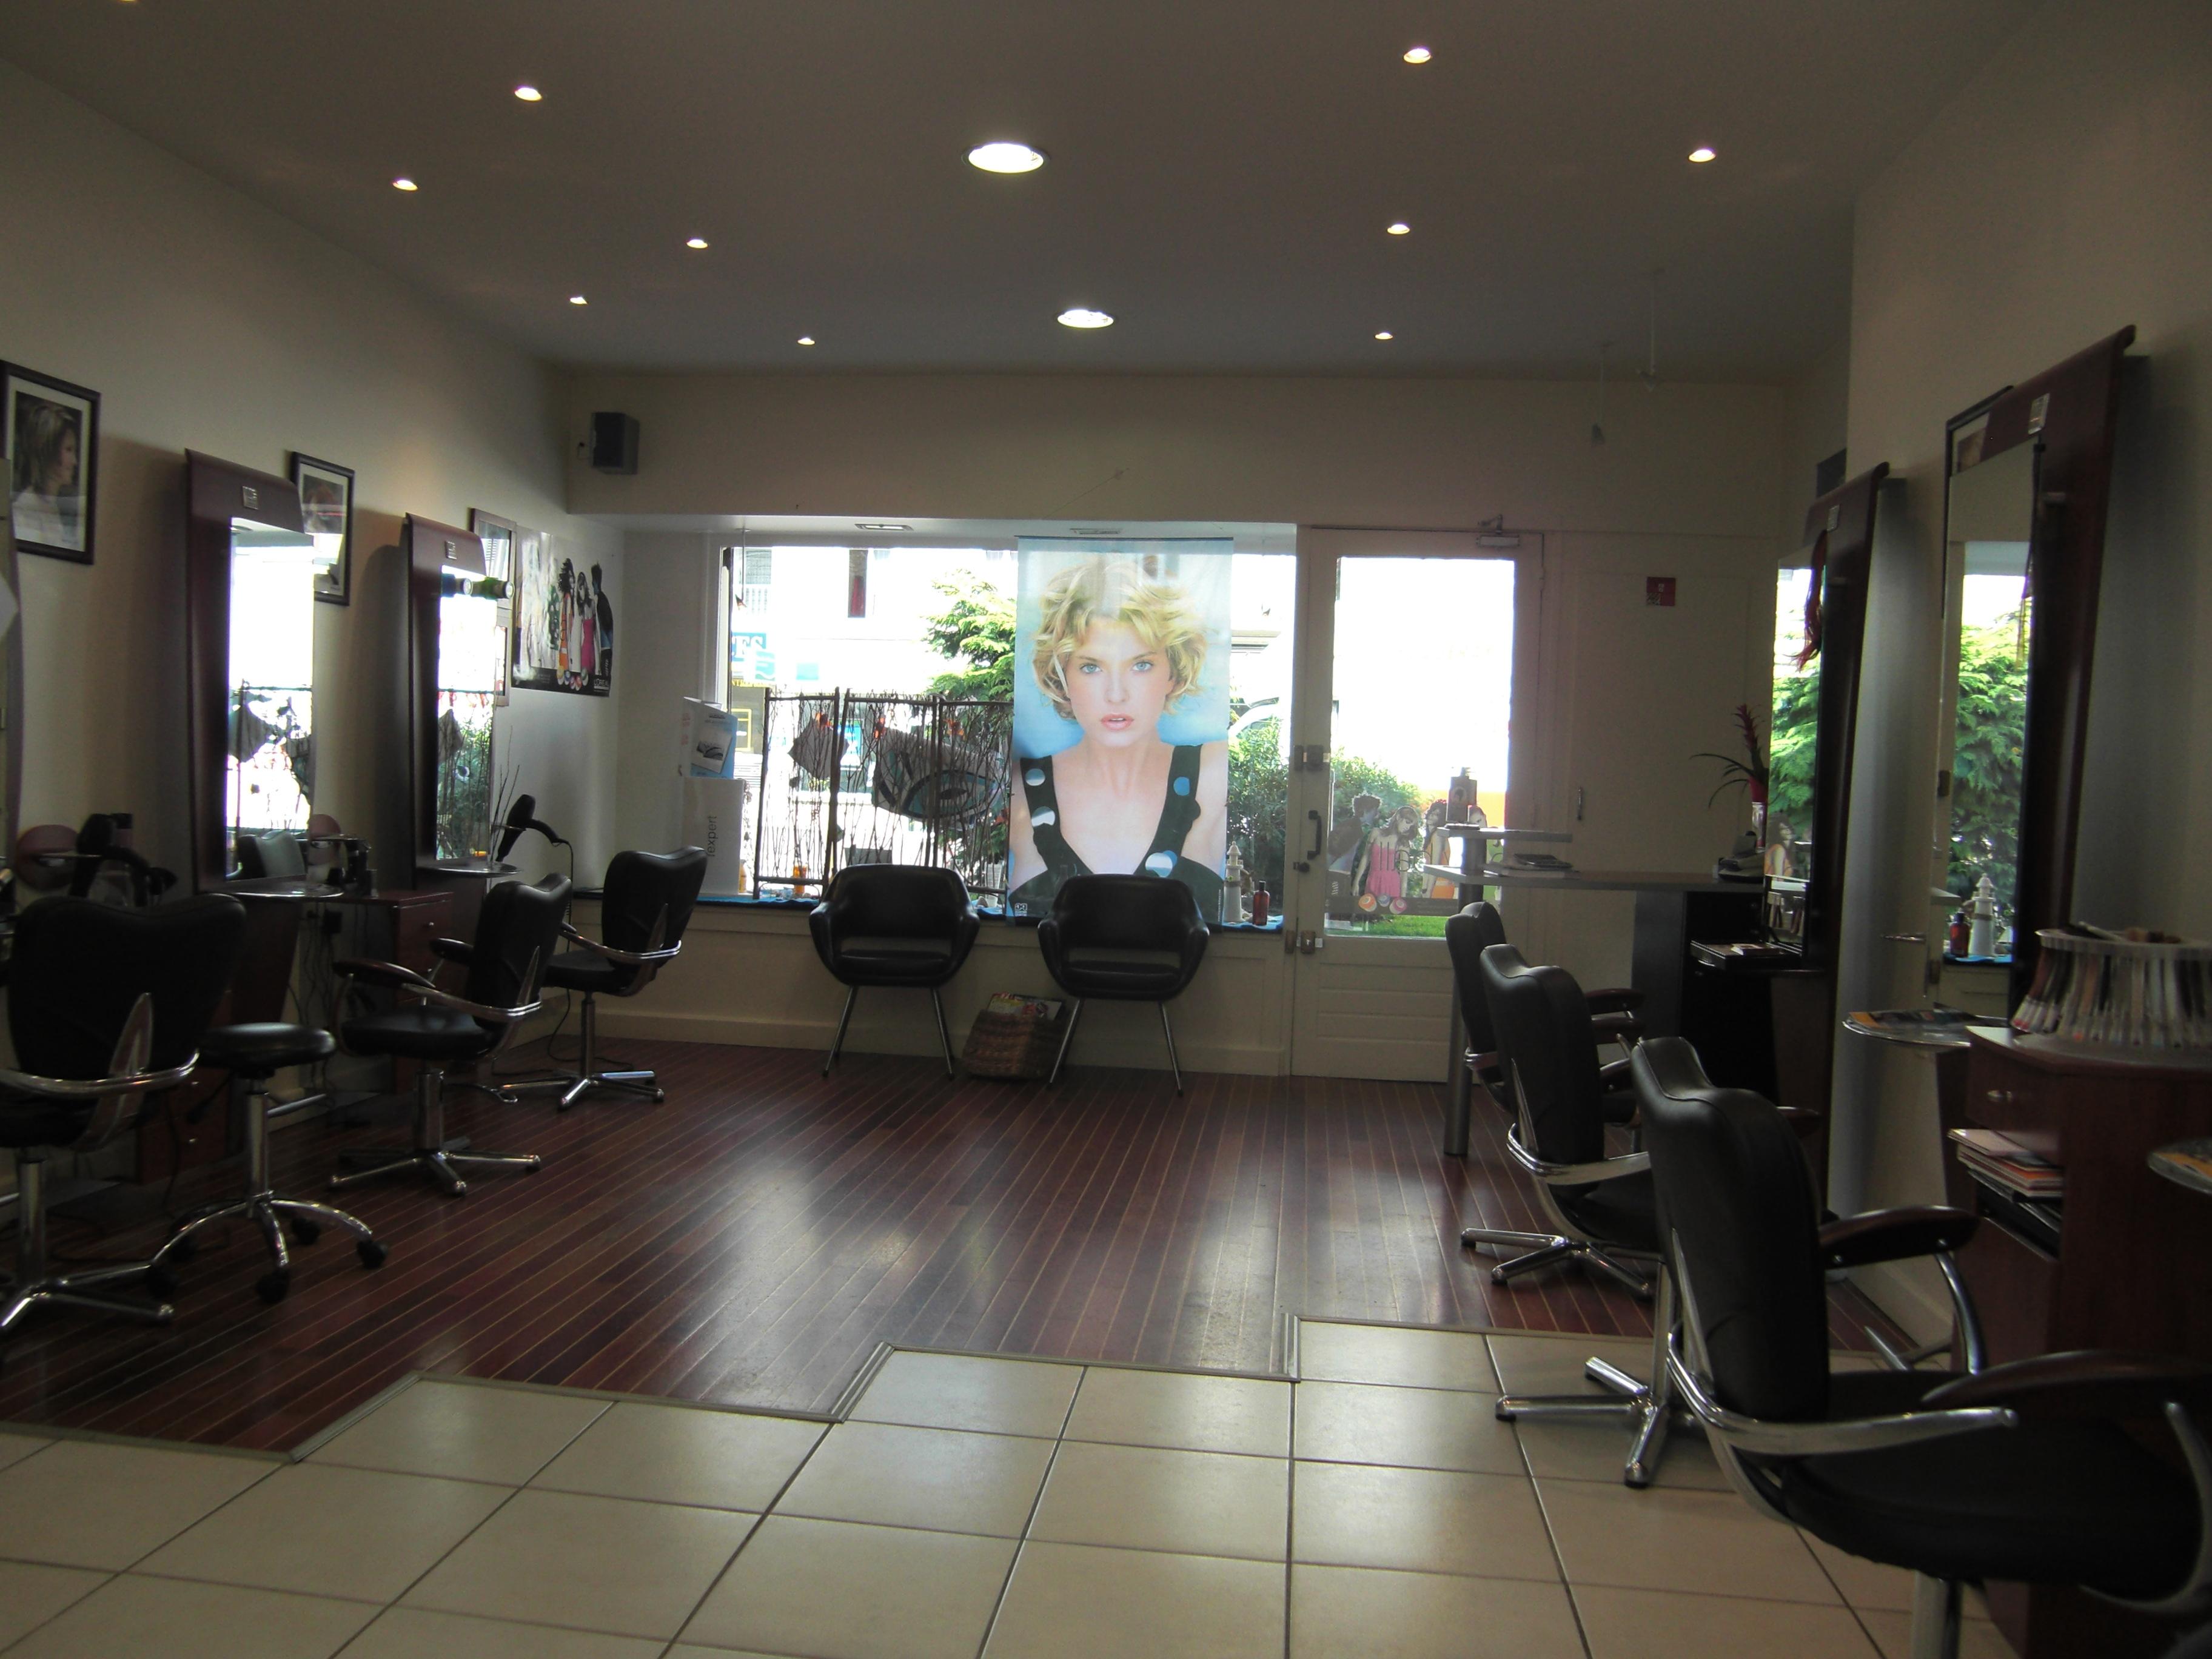 H l na coiff chartres avis tarifs horaires t l phone for Salon de coiffure chartres